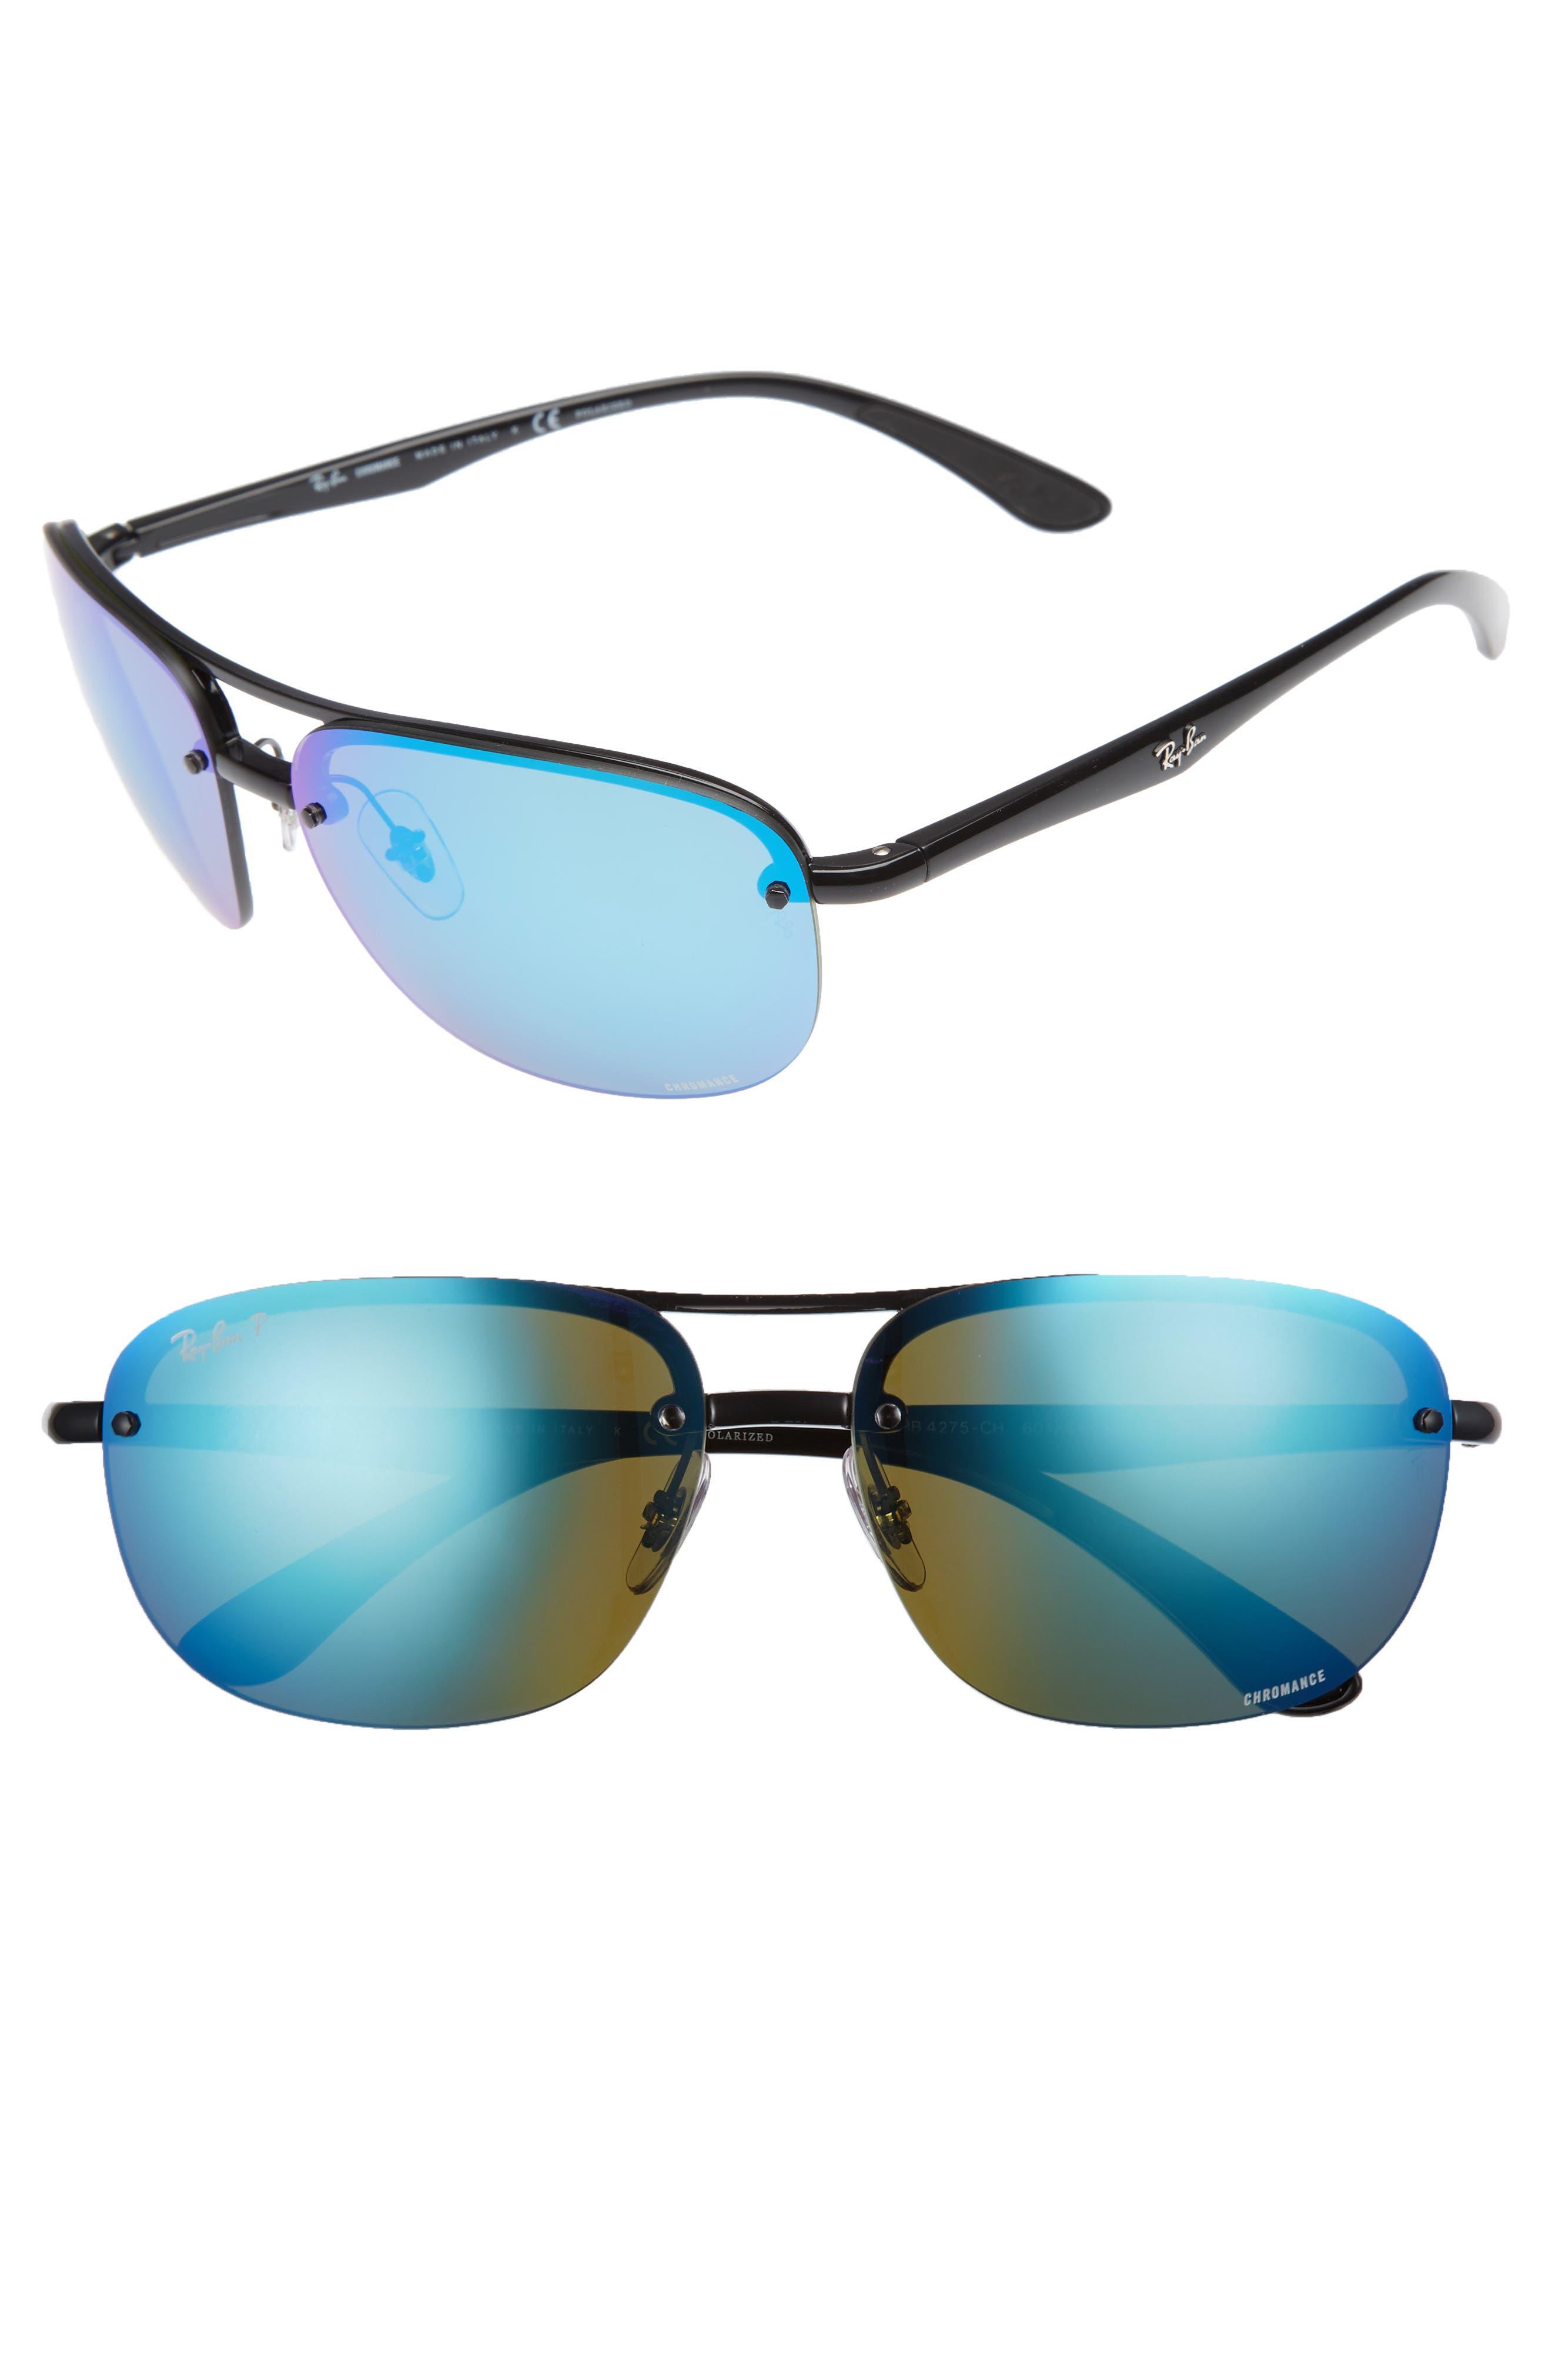 Chromance 63mm Polarized Square Sunglasses,                         Main,                         color, Black